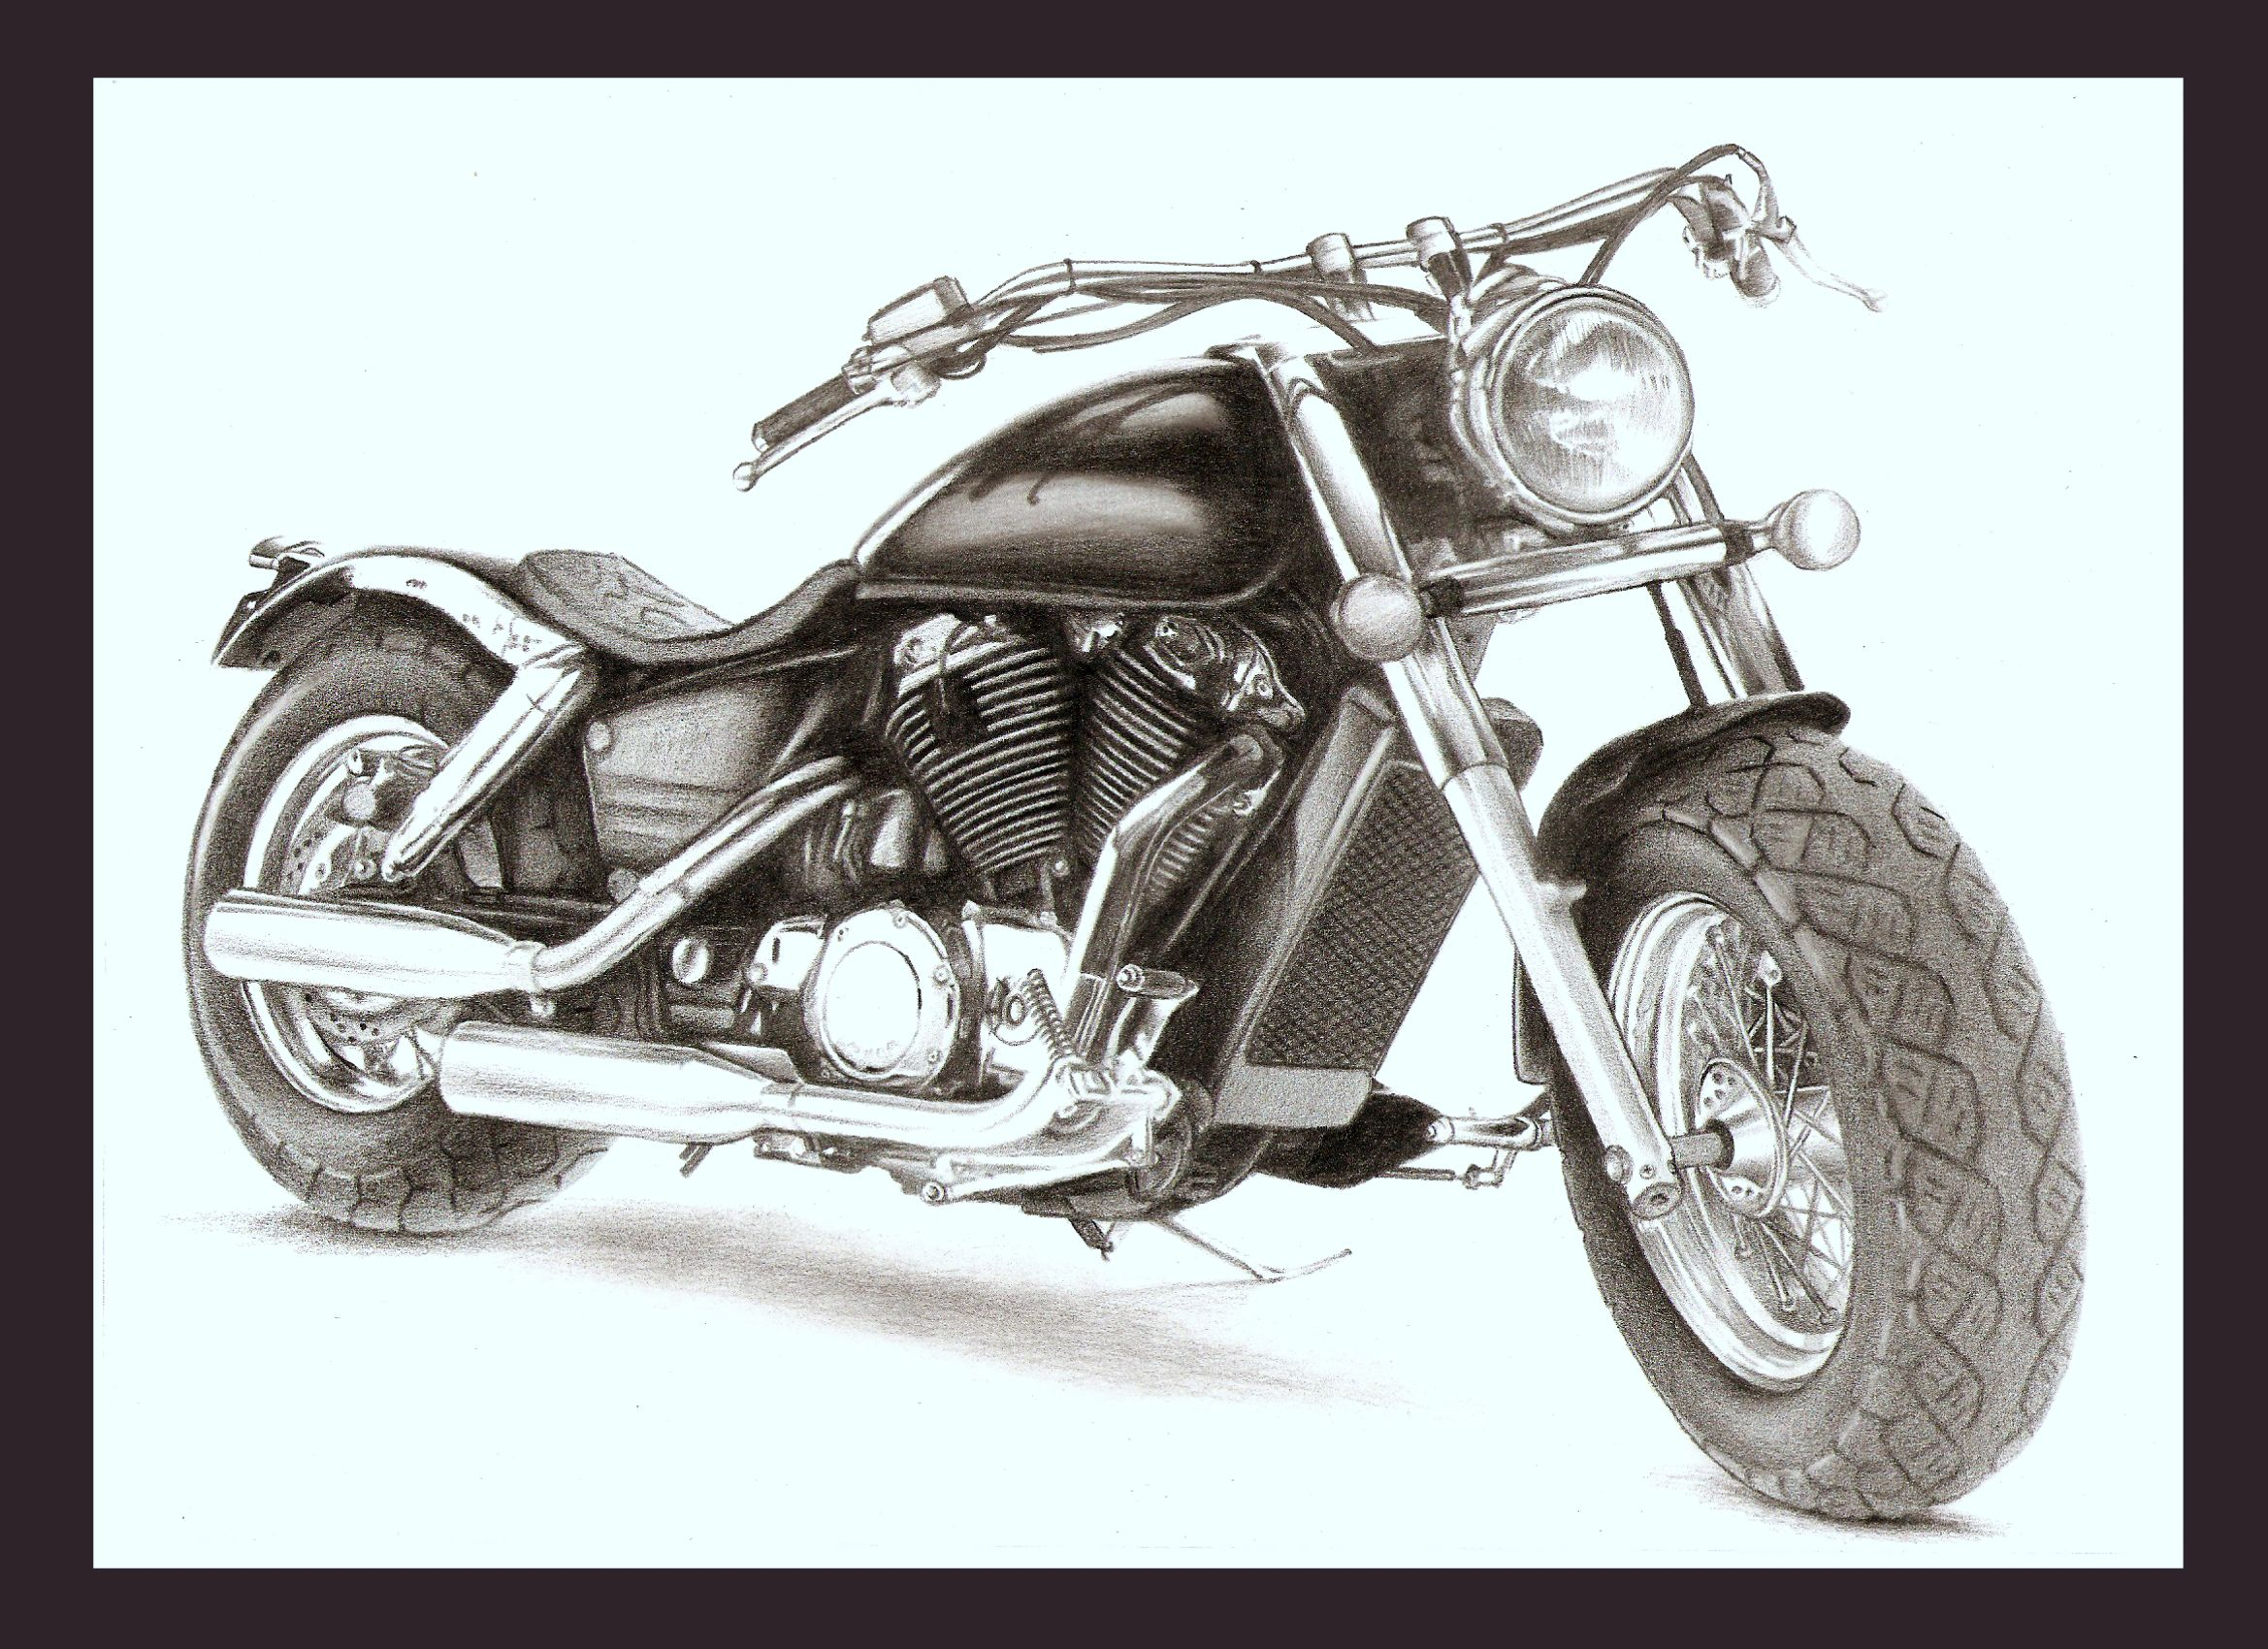 2338x1700 Davidson By Rainboray